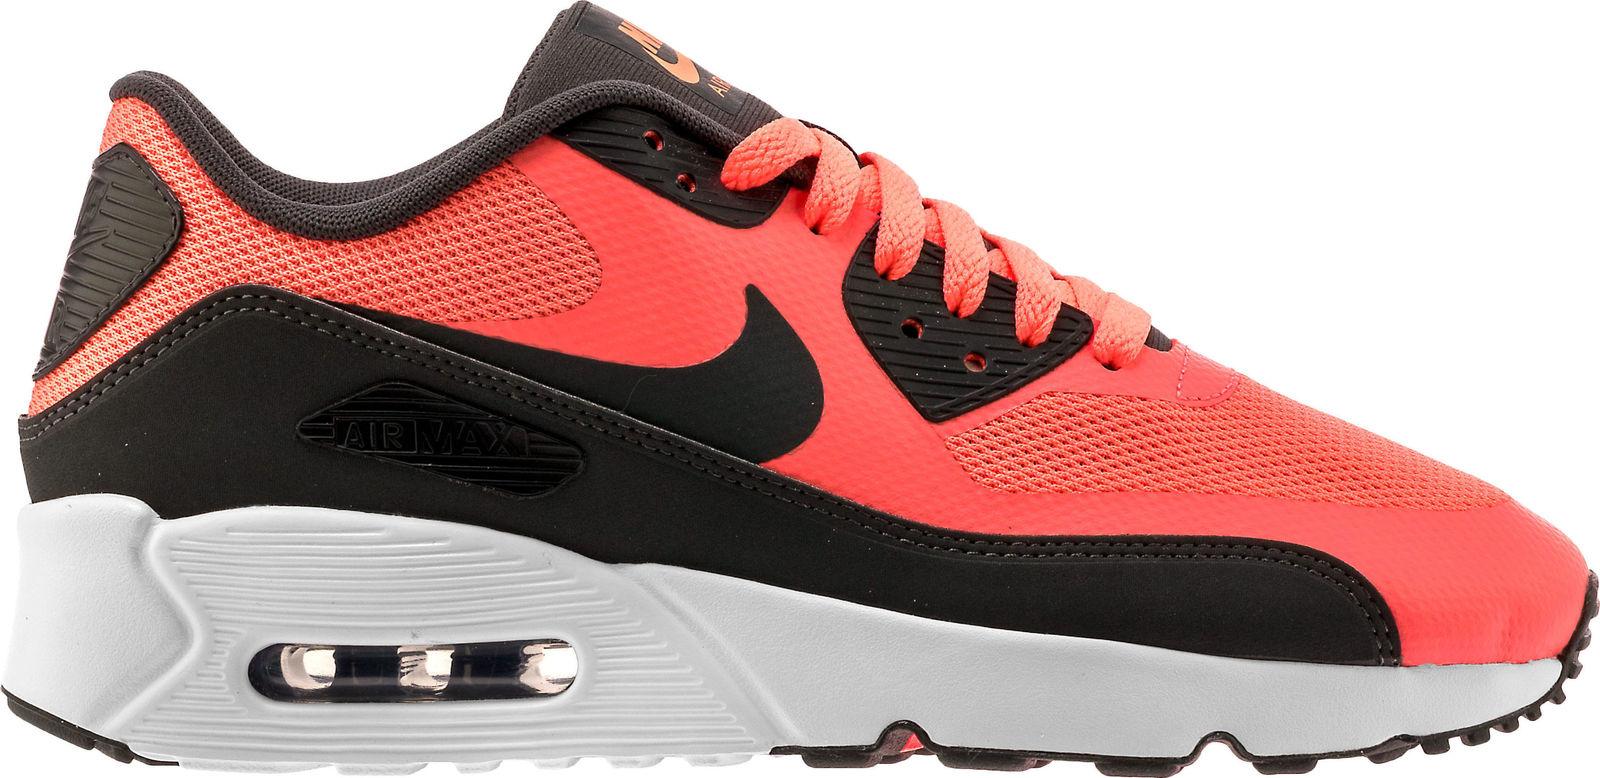 new concept af5bb 3e594 Προσθήκη στα αγαπημένα menu Nike Air Max 90 Ultra 2 0